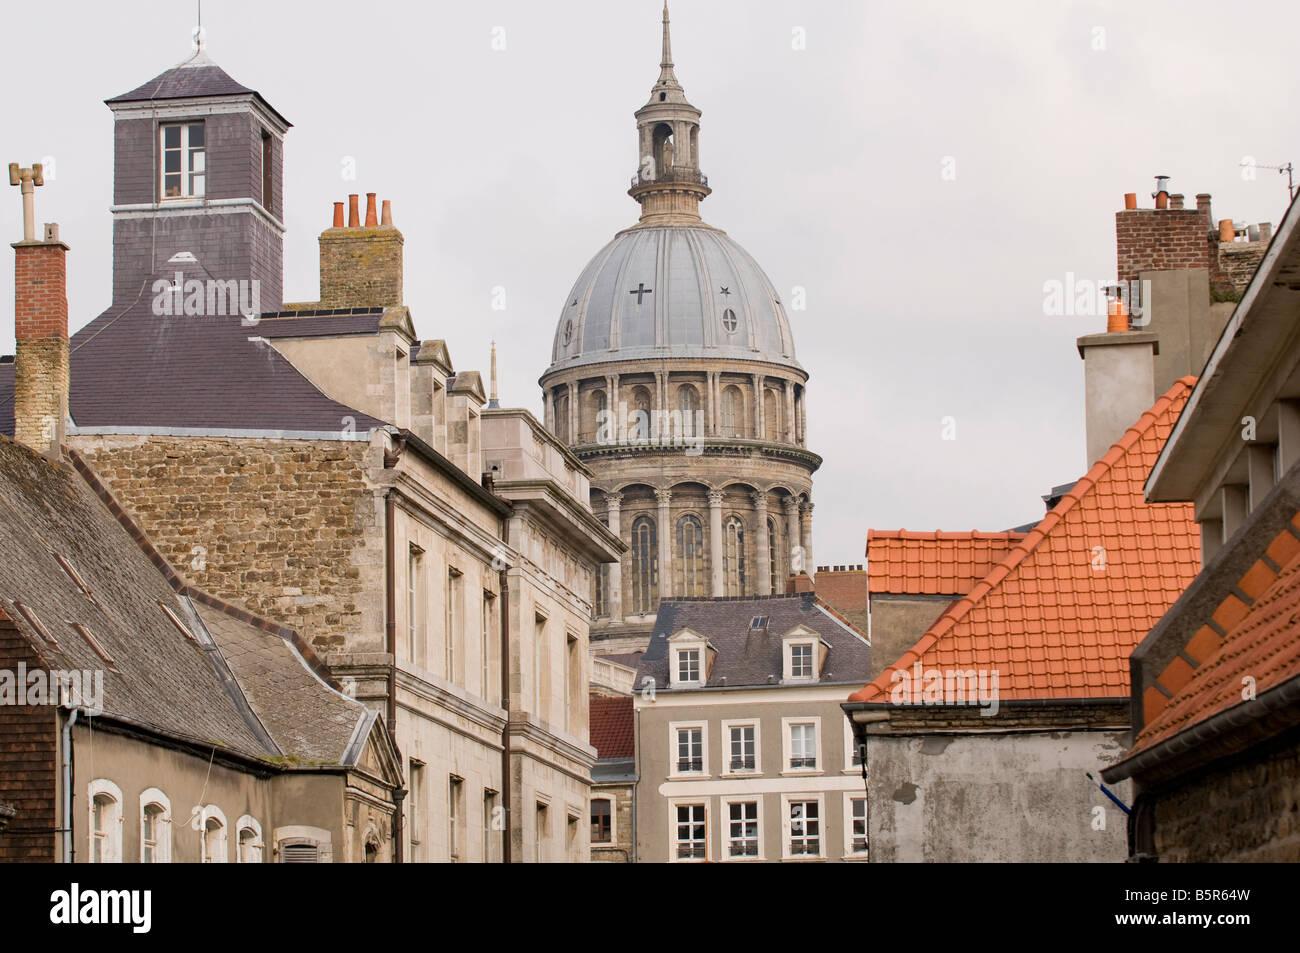 Cathedral of Notre Dame Boulogne sur Mer Pas de Calais and historical city, France - Stock Image